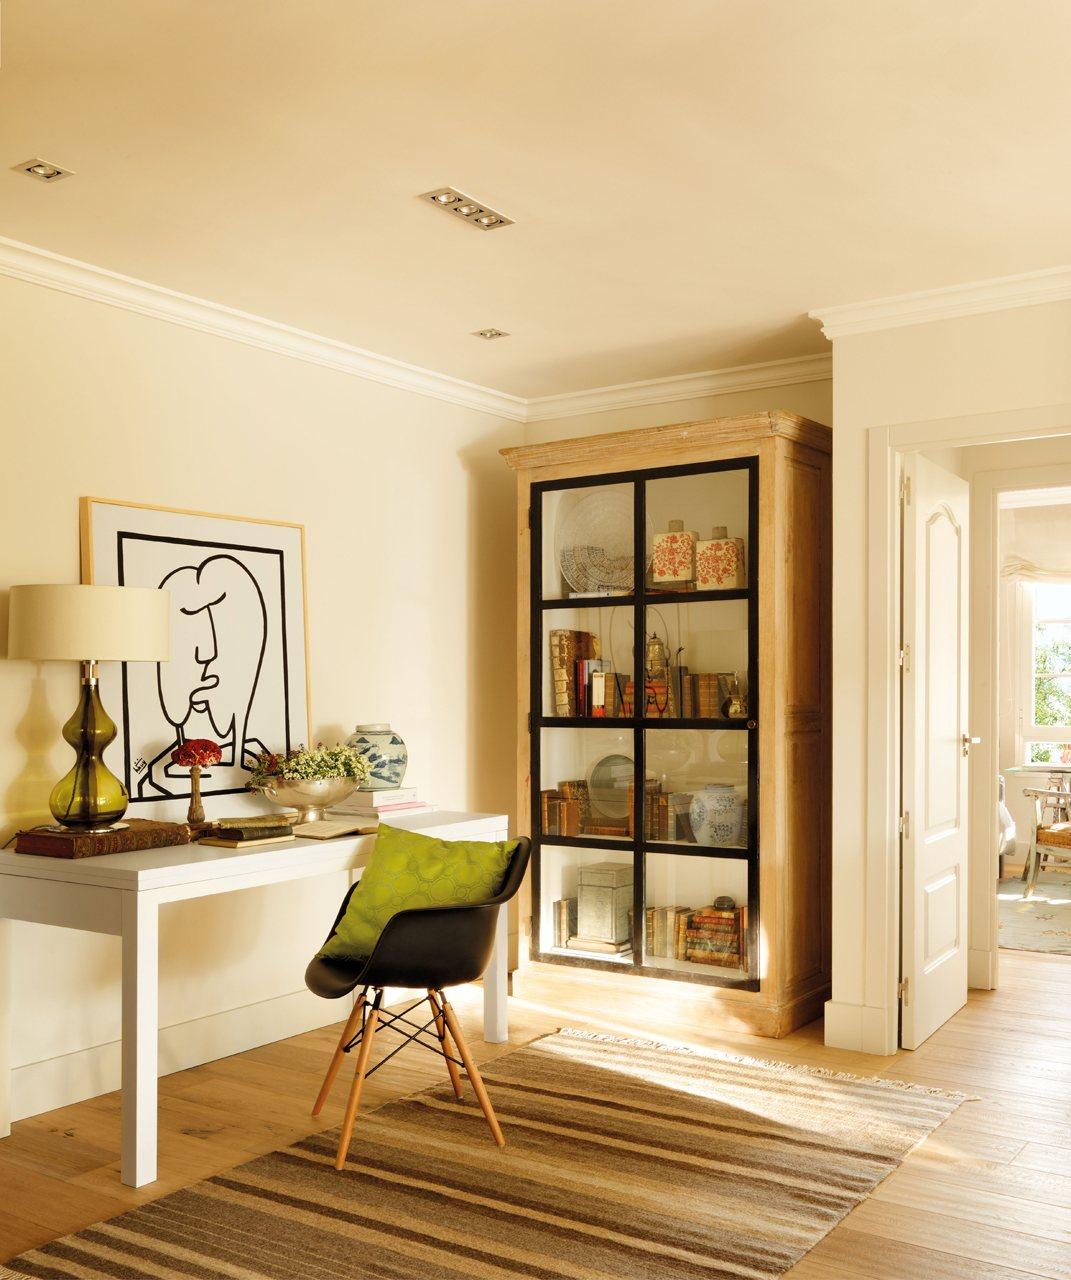 Primer piso de la interiorista beatriz silveira - As interiorista ...